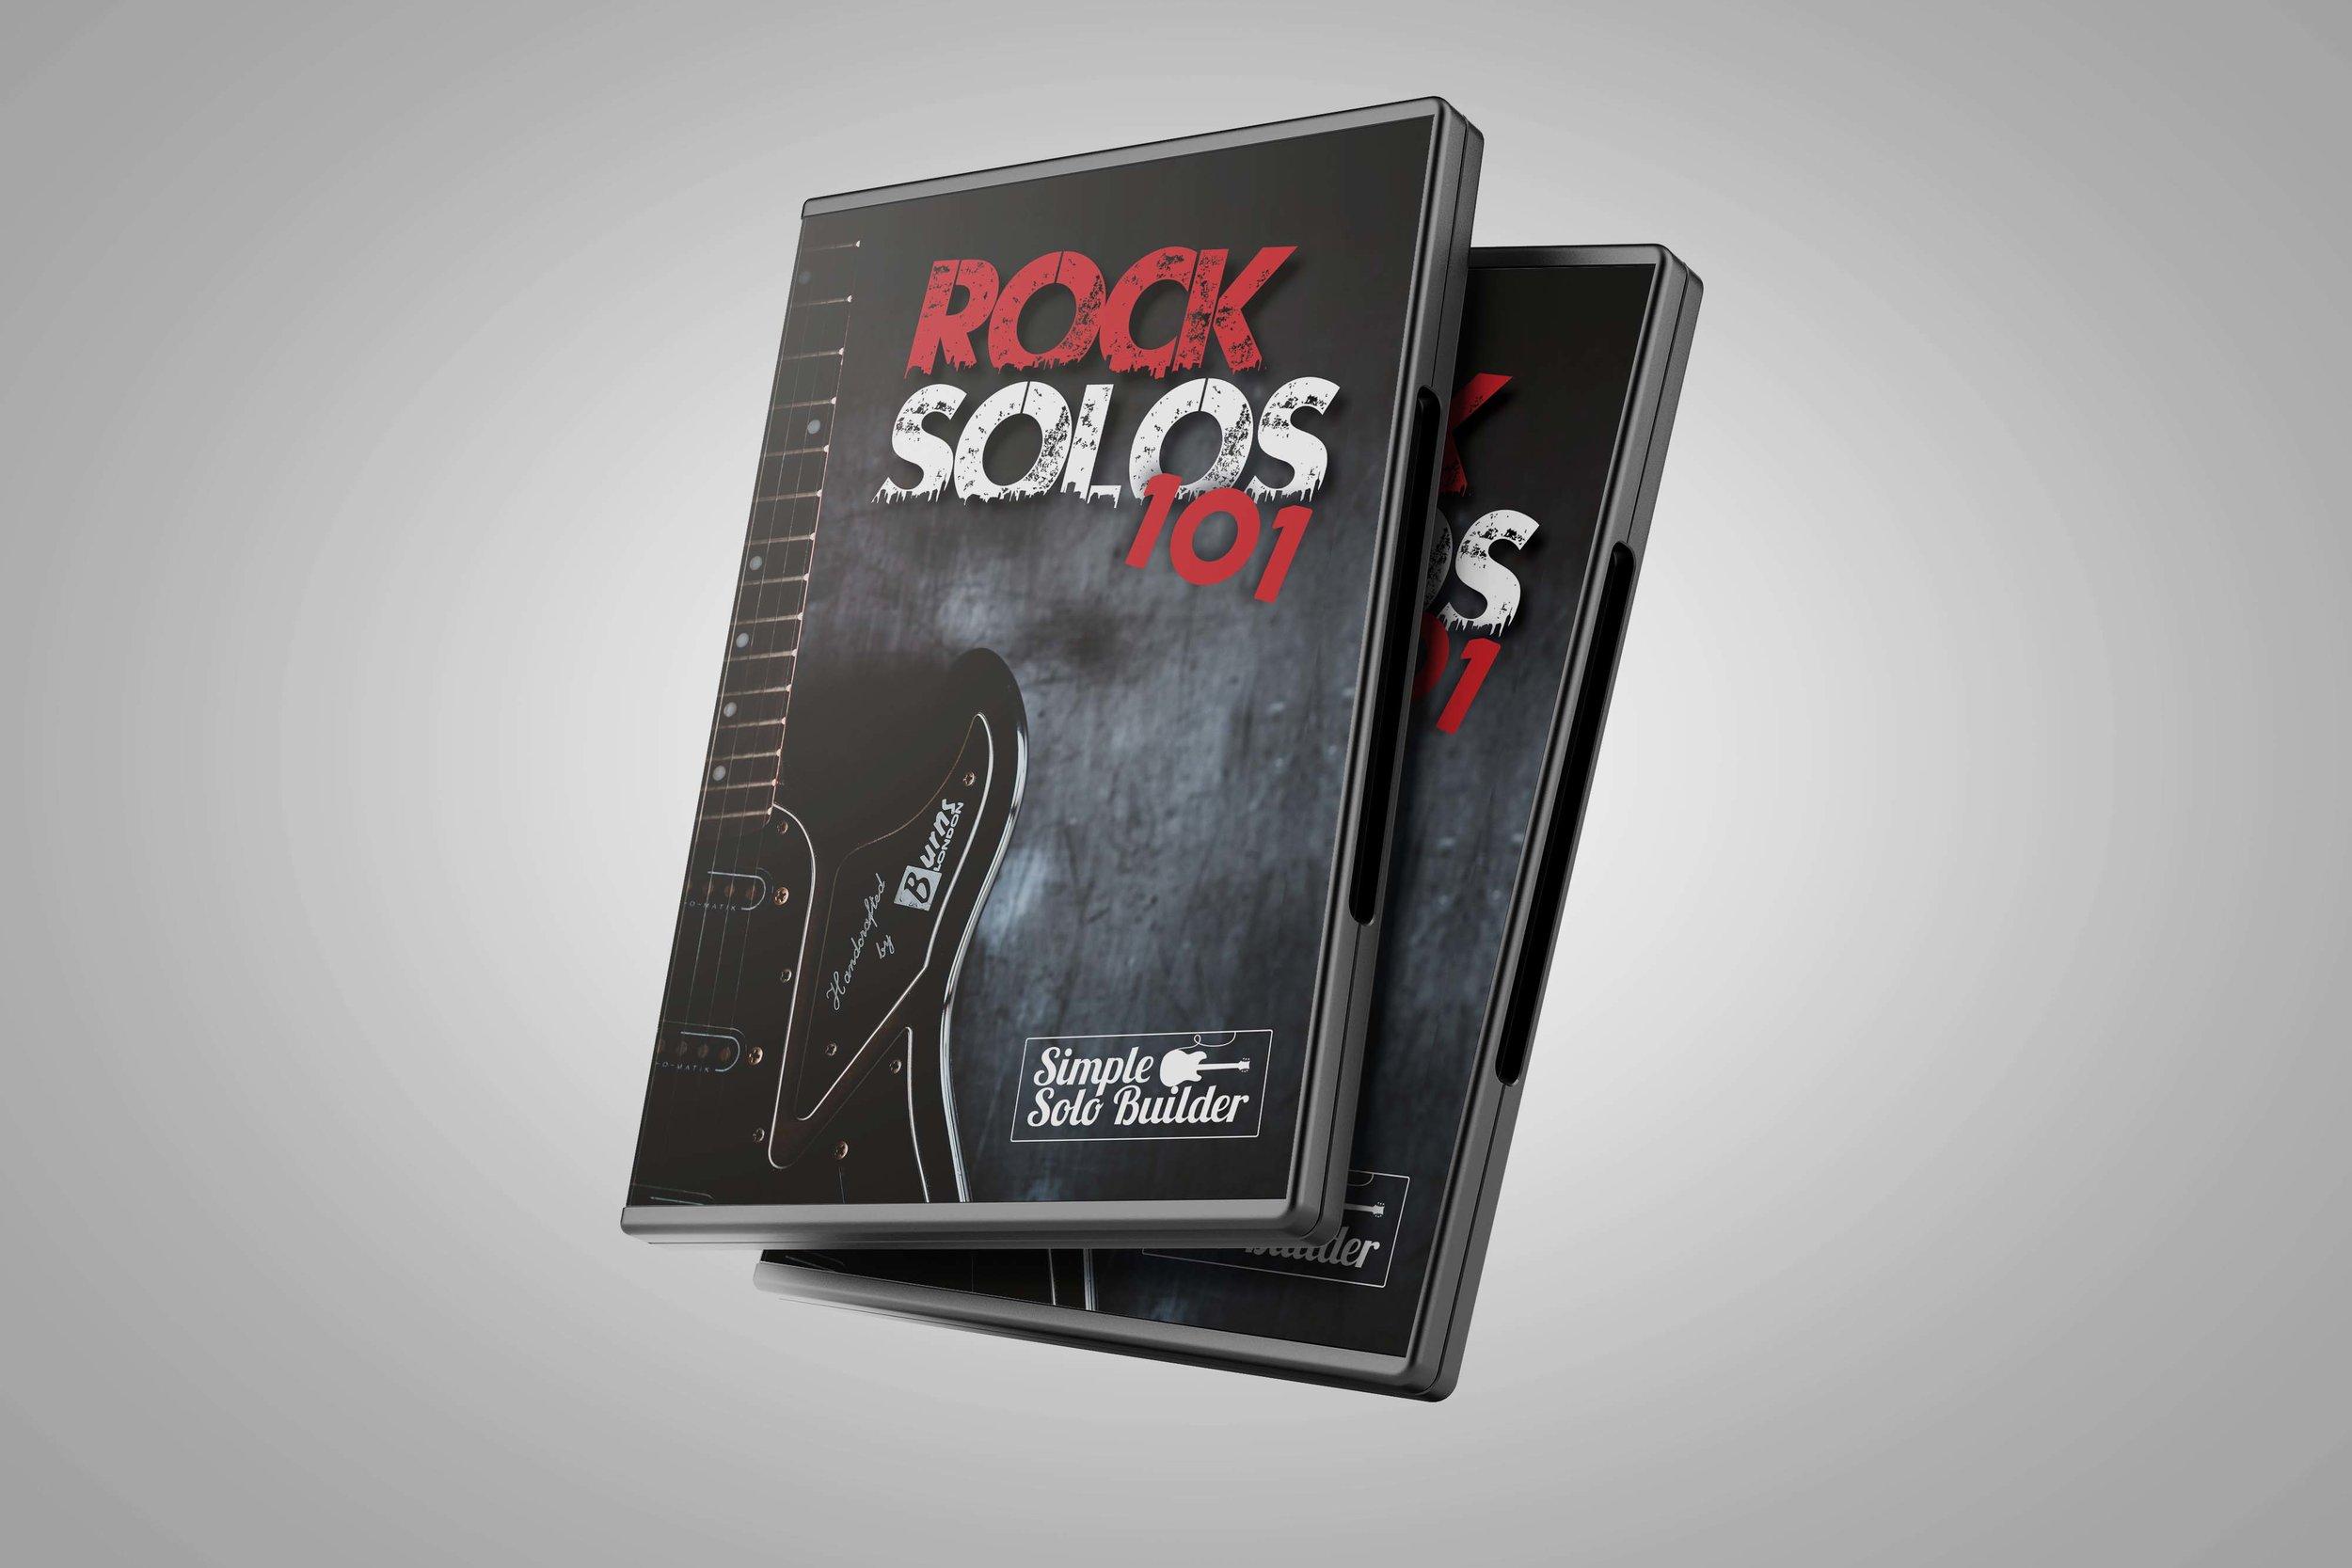 RockSolo101_V1.jpg